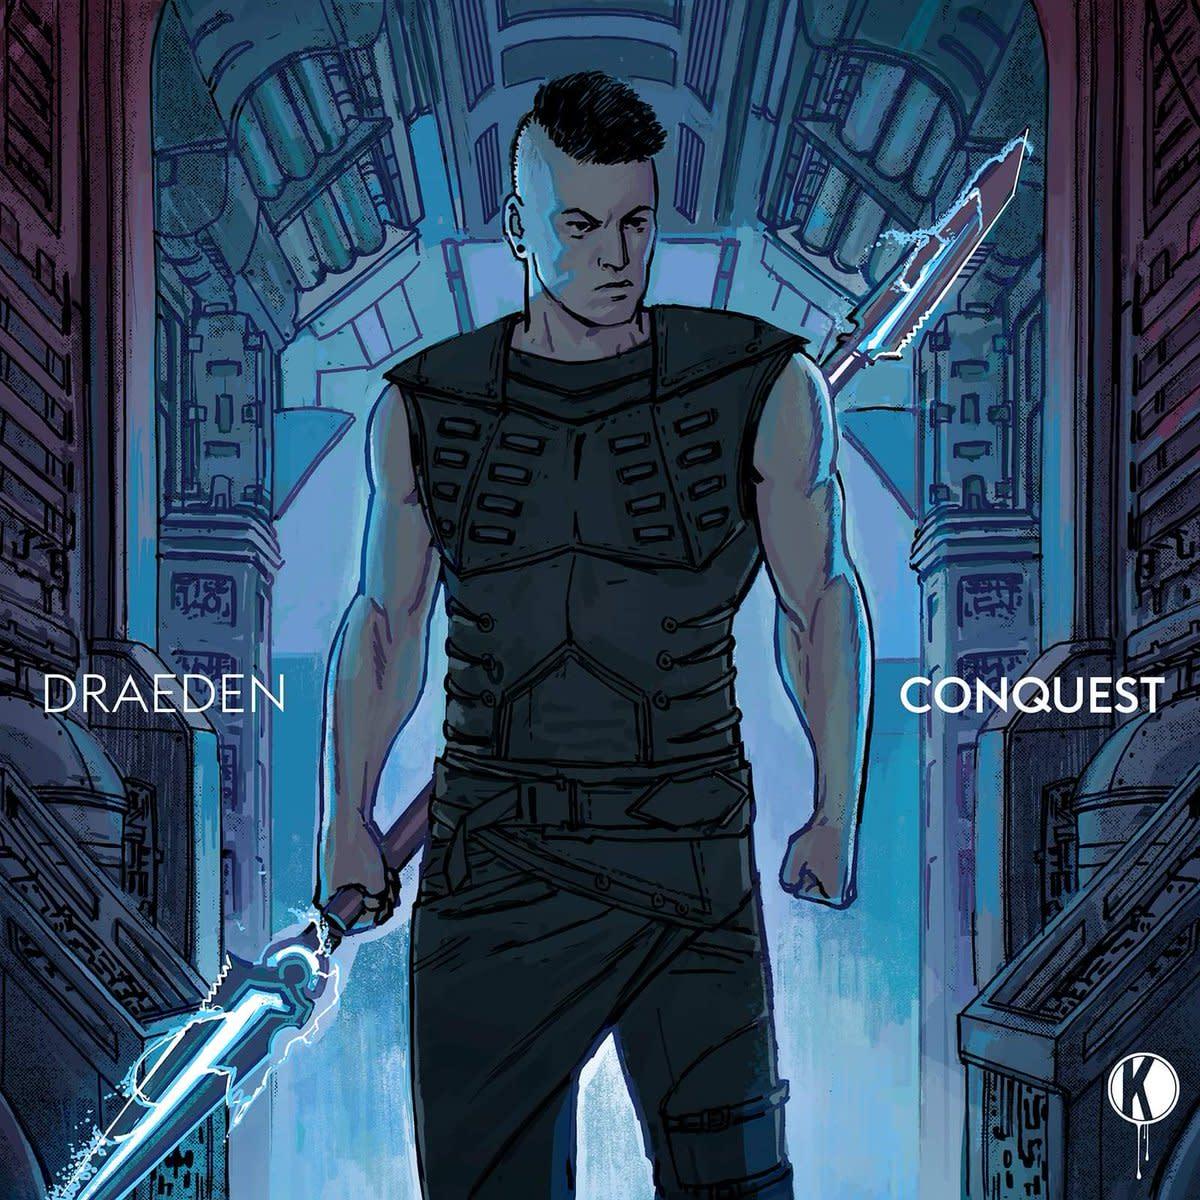 Draeden - Conquest EP (Kannibalen Records) - ALBUM ARTWORK